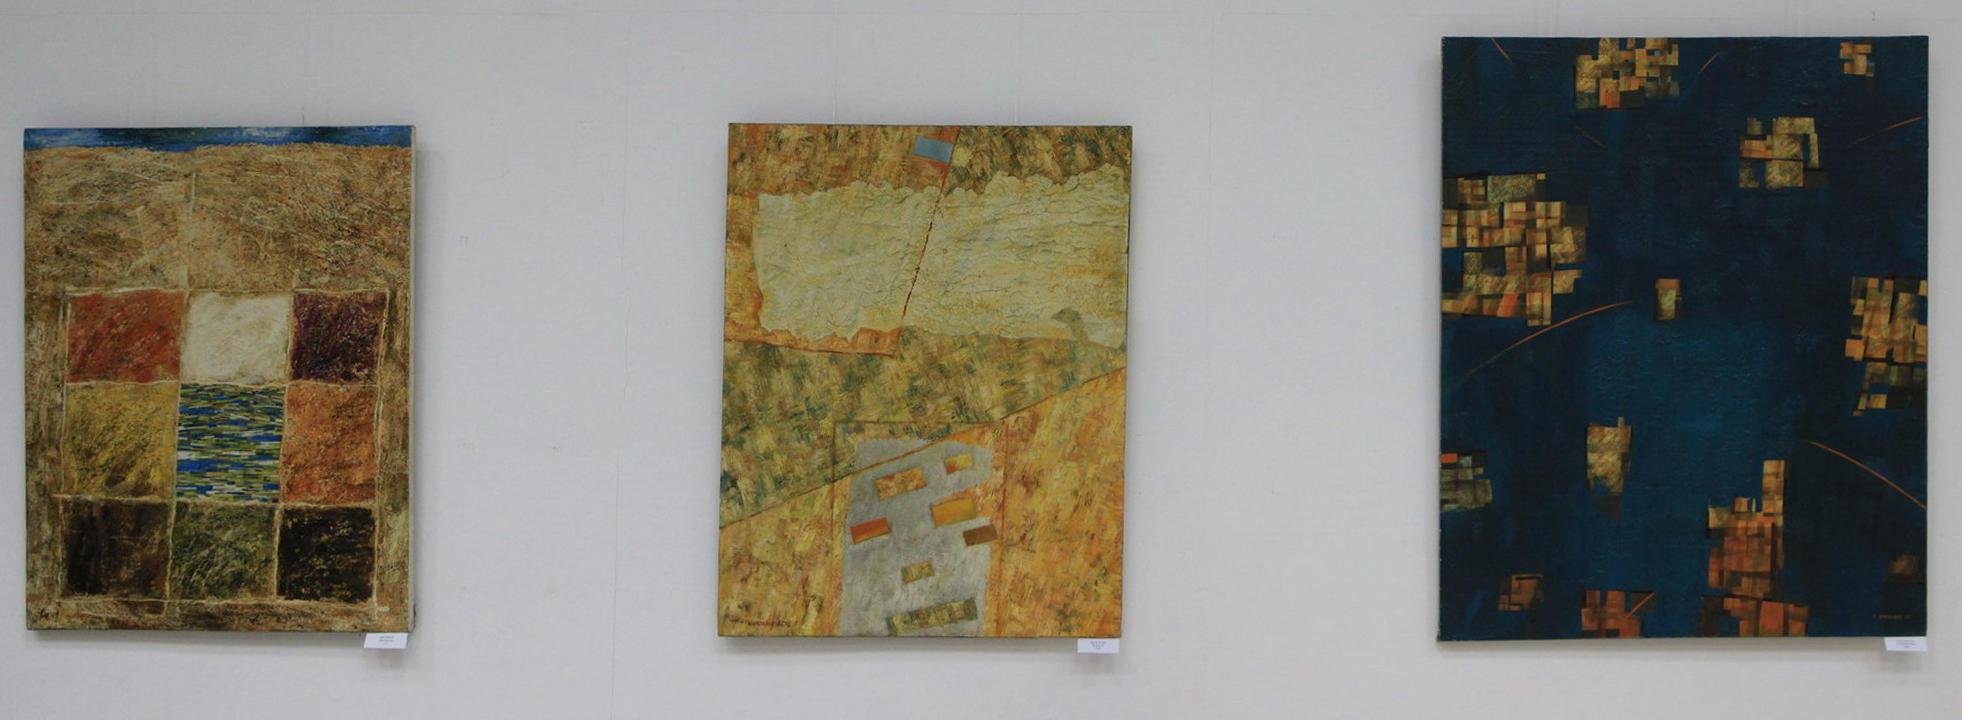 Александр Николаев. Начала, 1997, Пласт. 1998, Структура. 2000